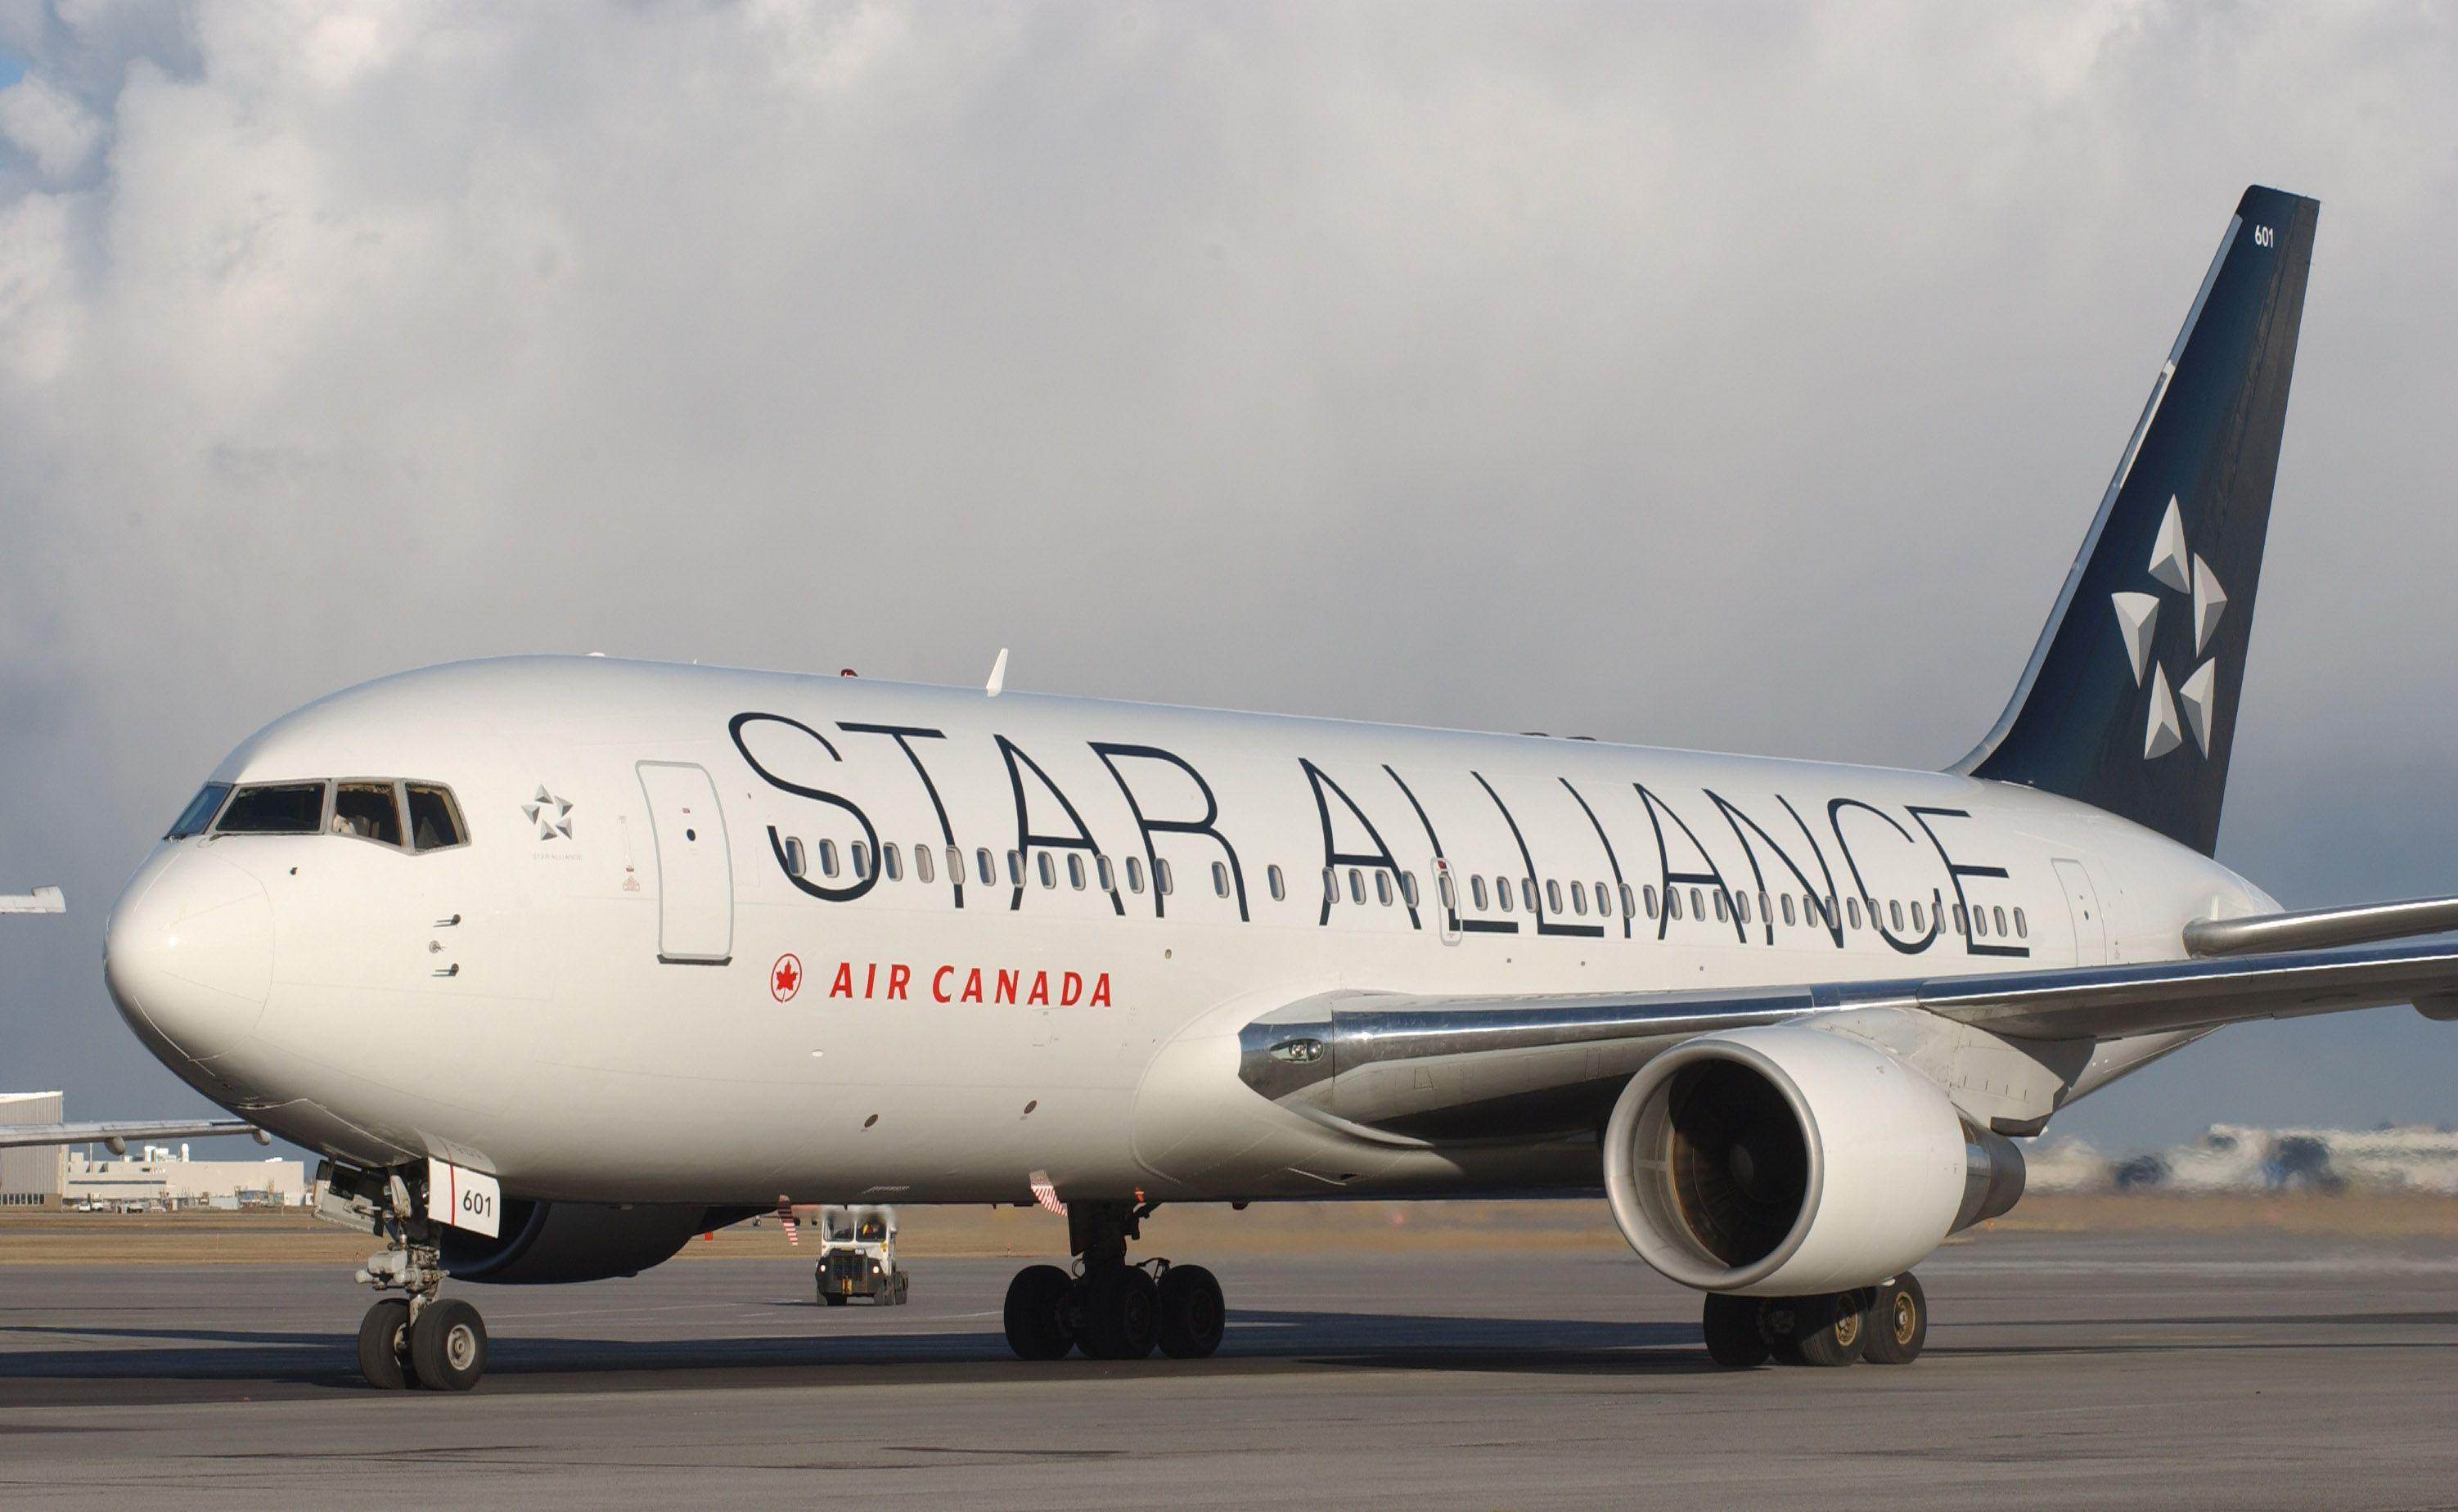 aeroplane wallpapers in hdaeroplane - photo #48